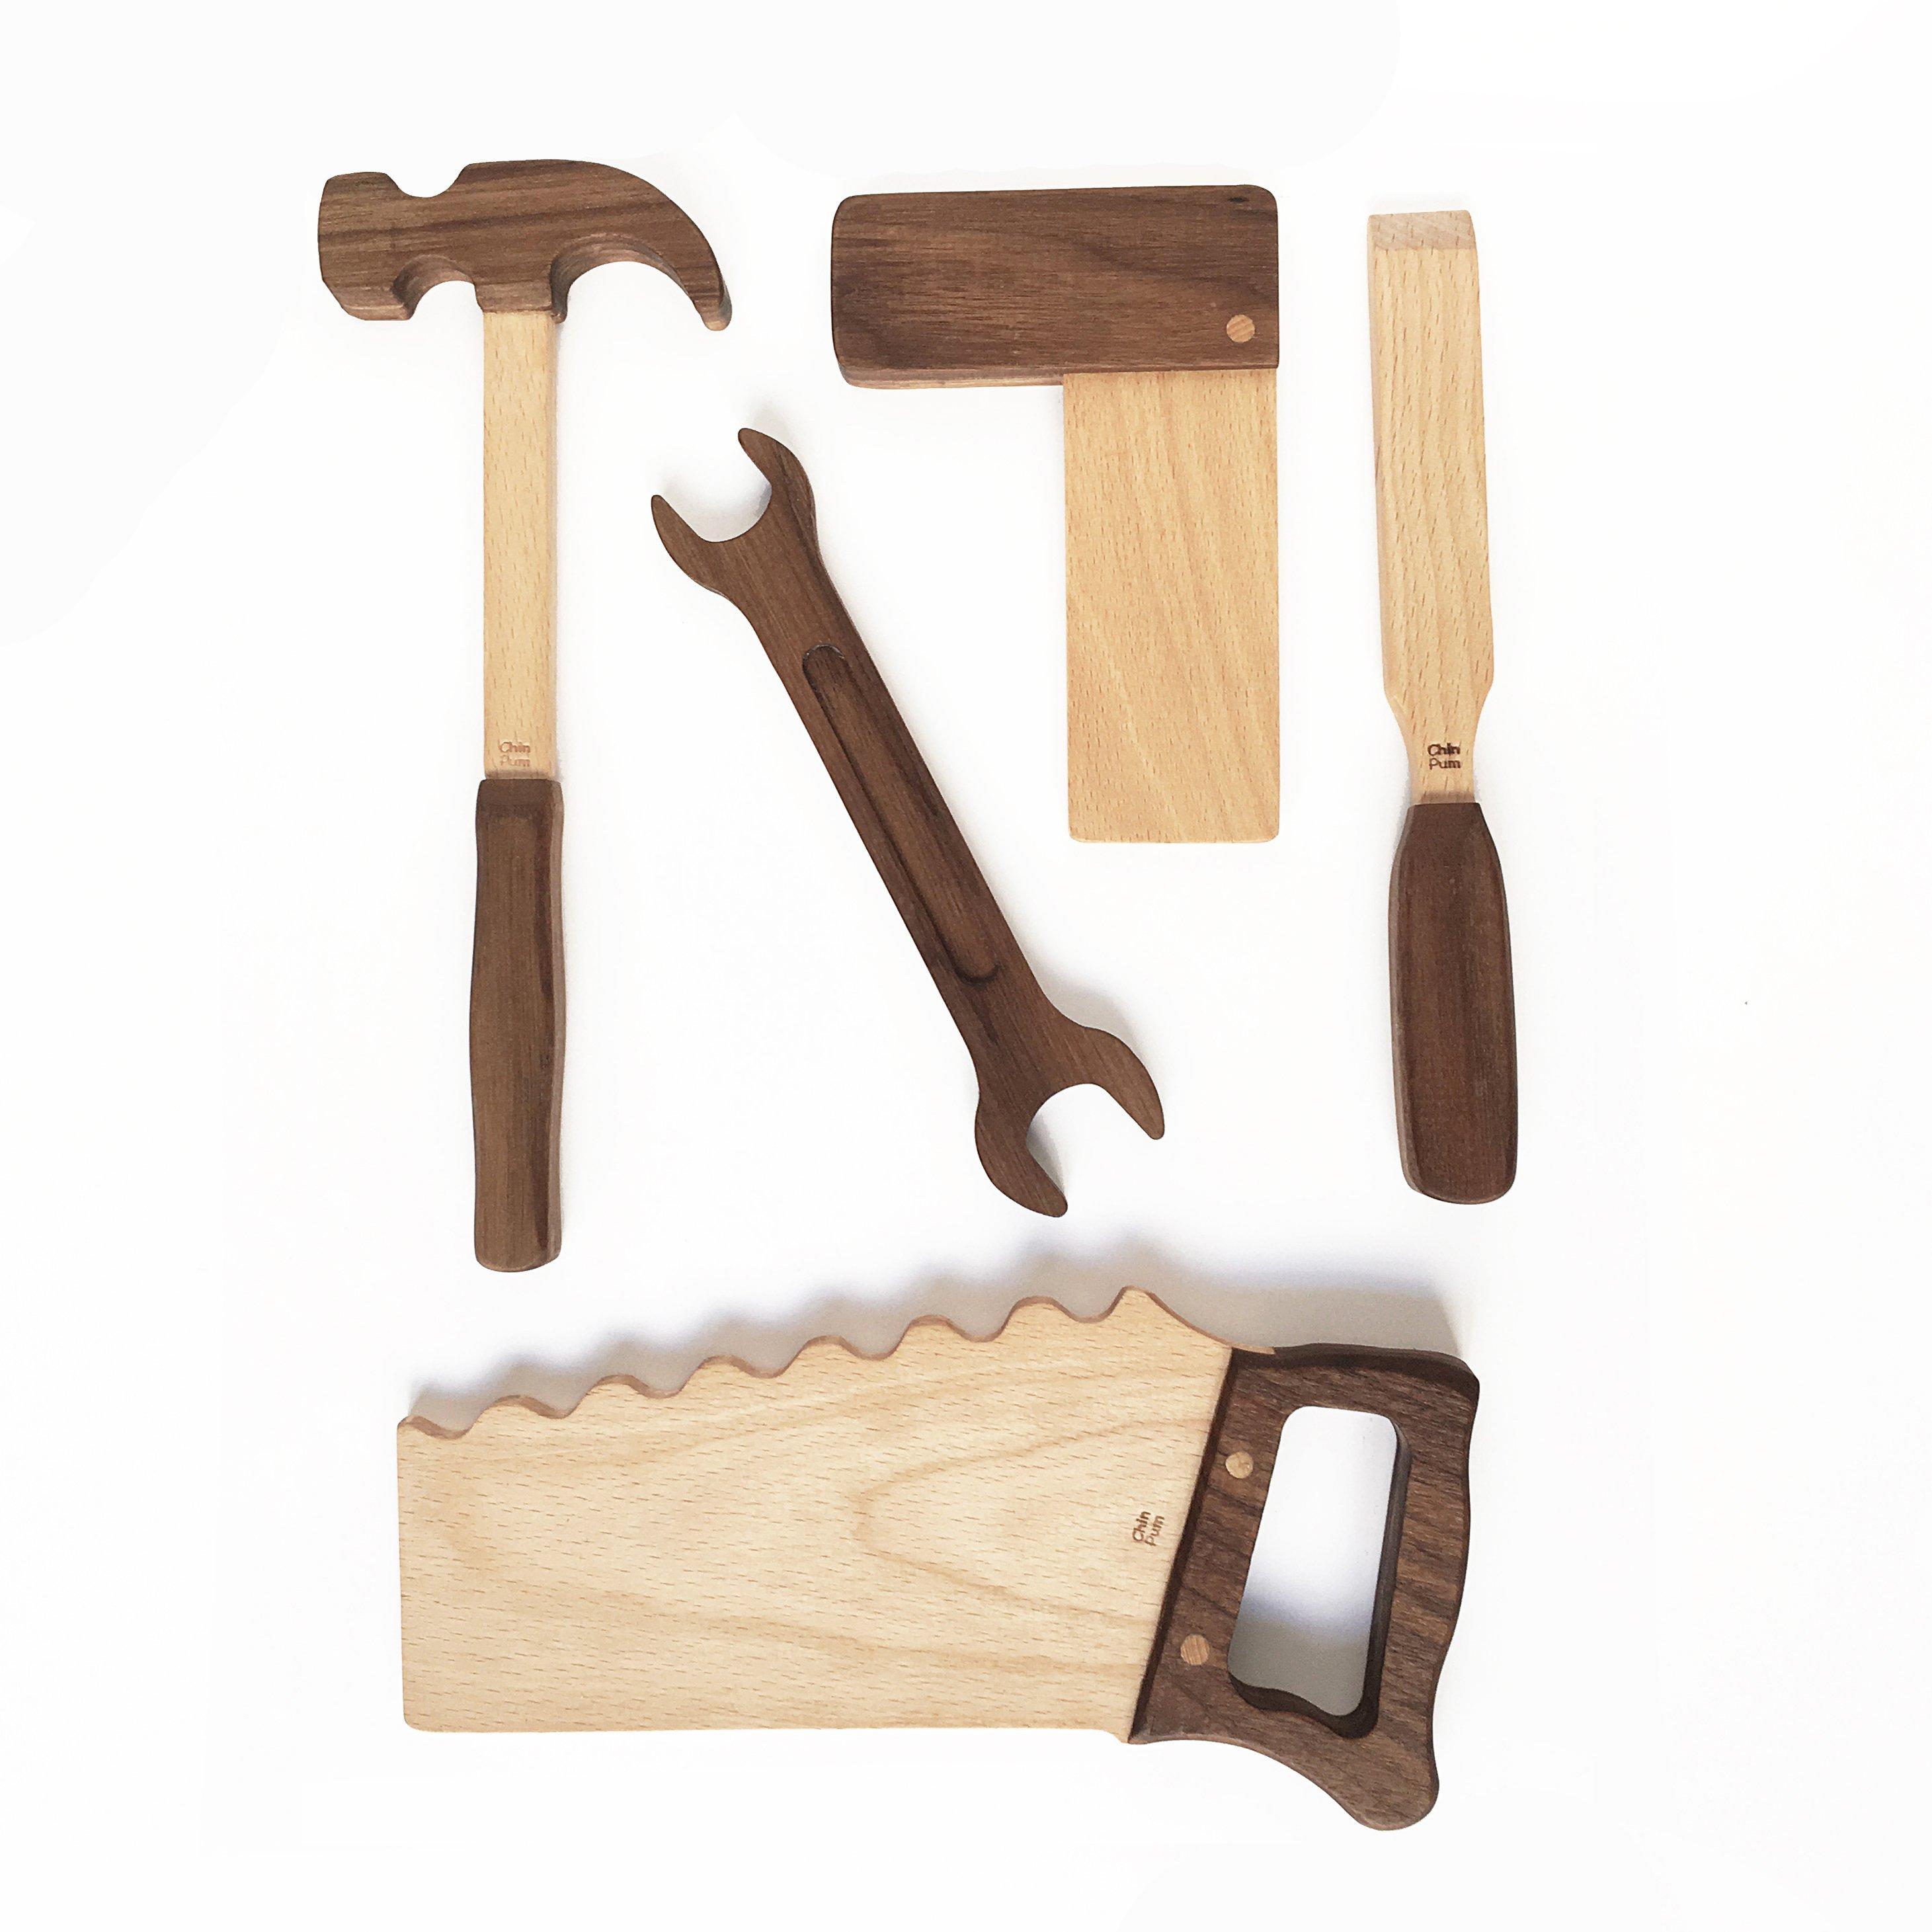 Herramientas para carpinteria en veracruz pictures to pin for Home depot herramientas